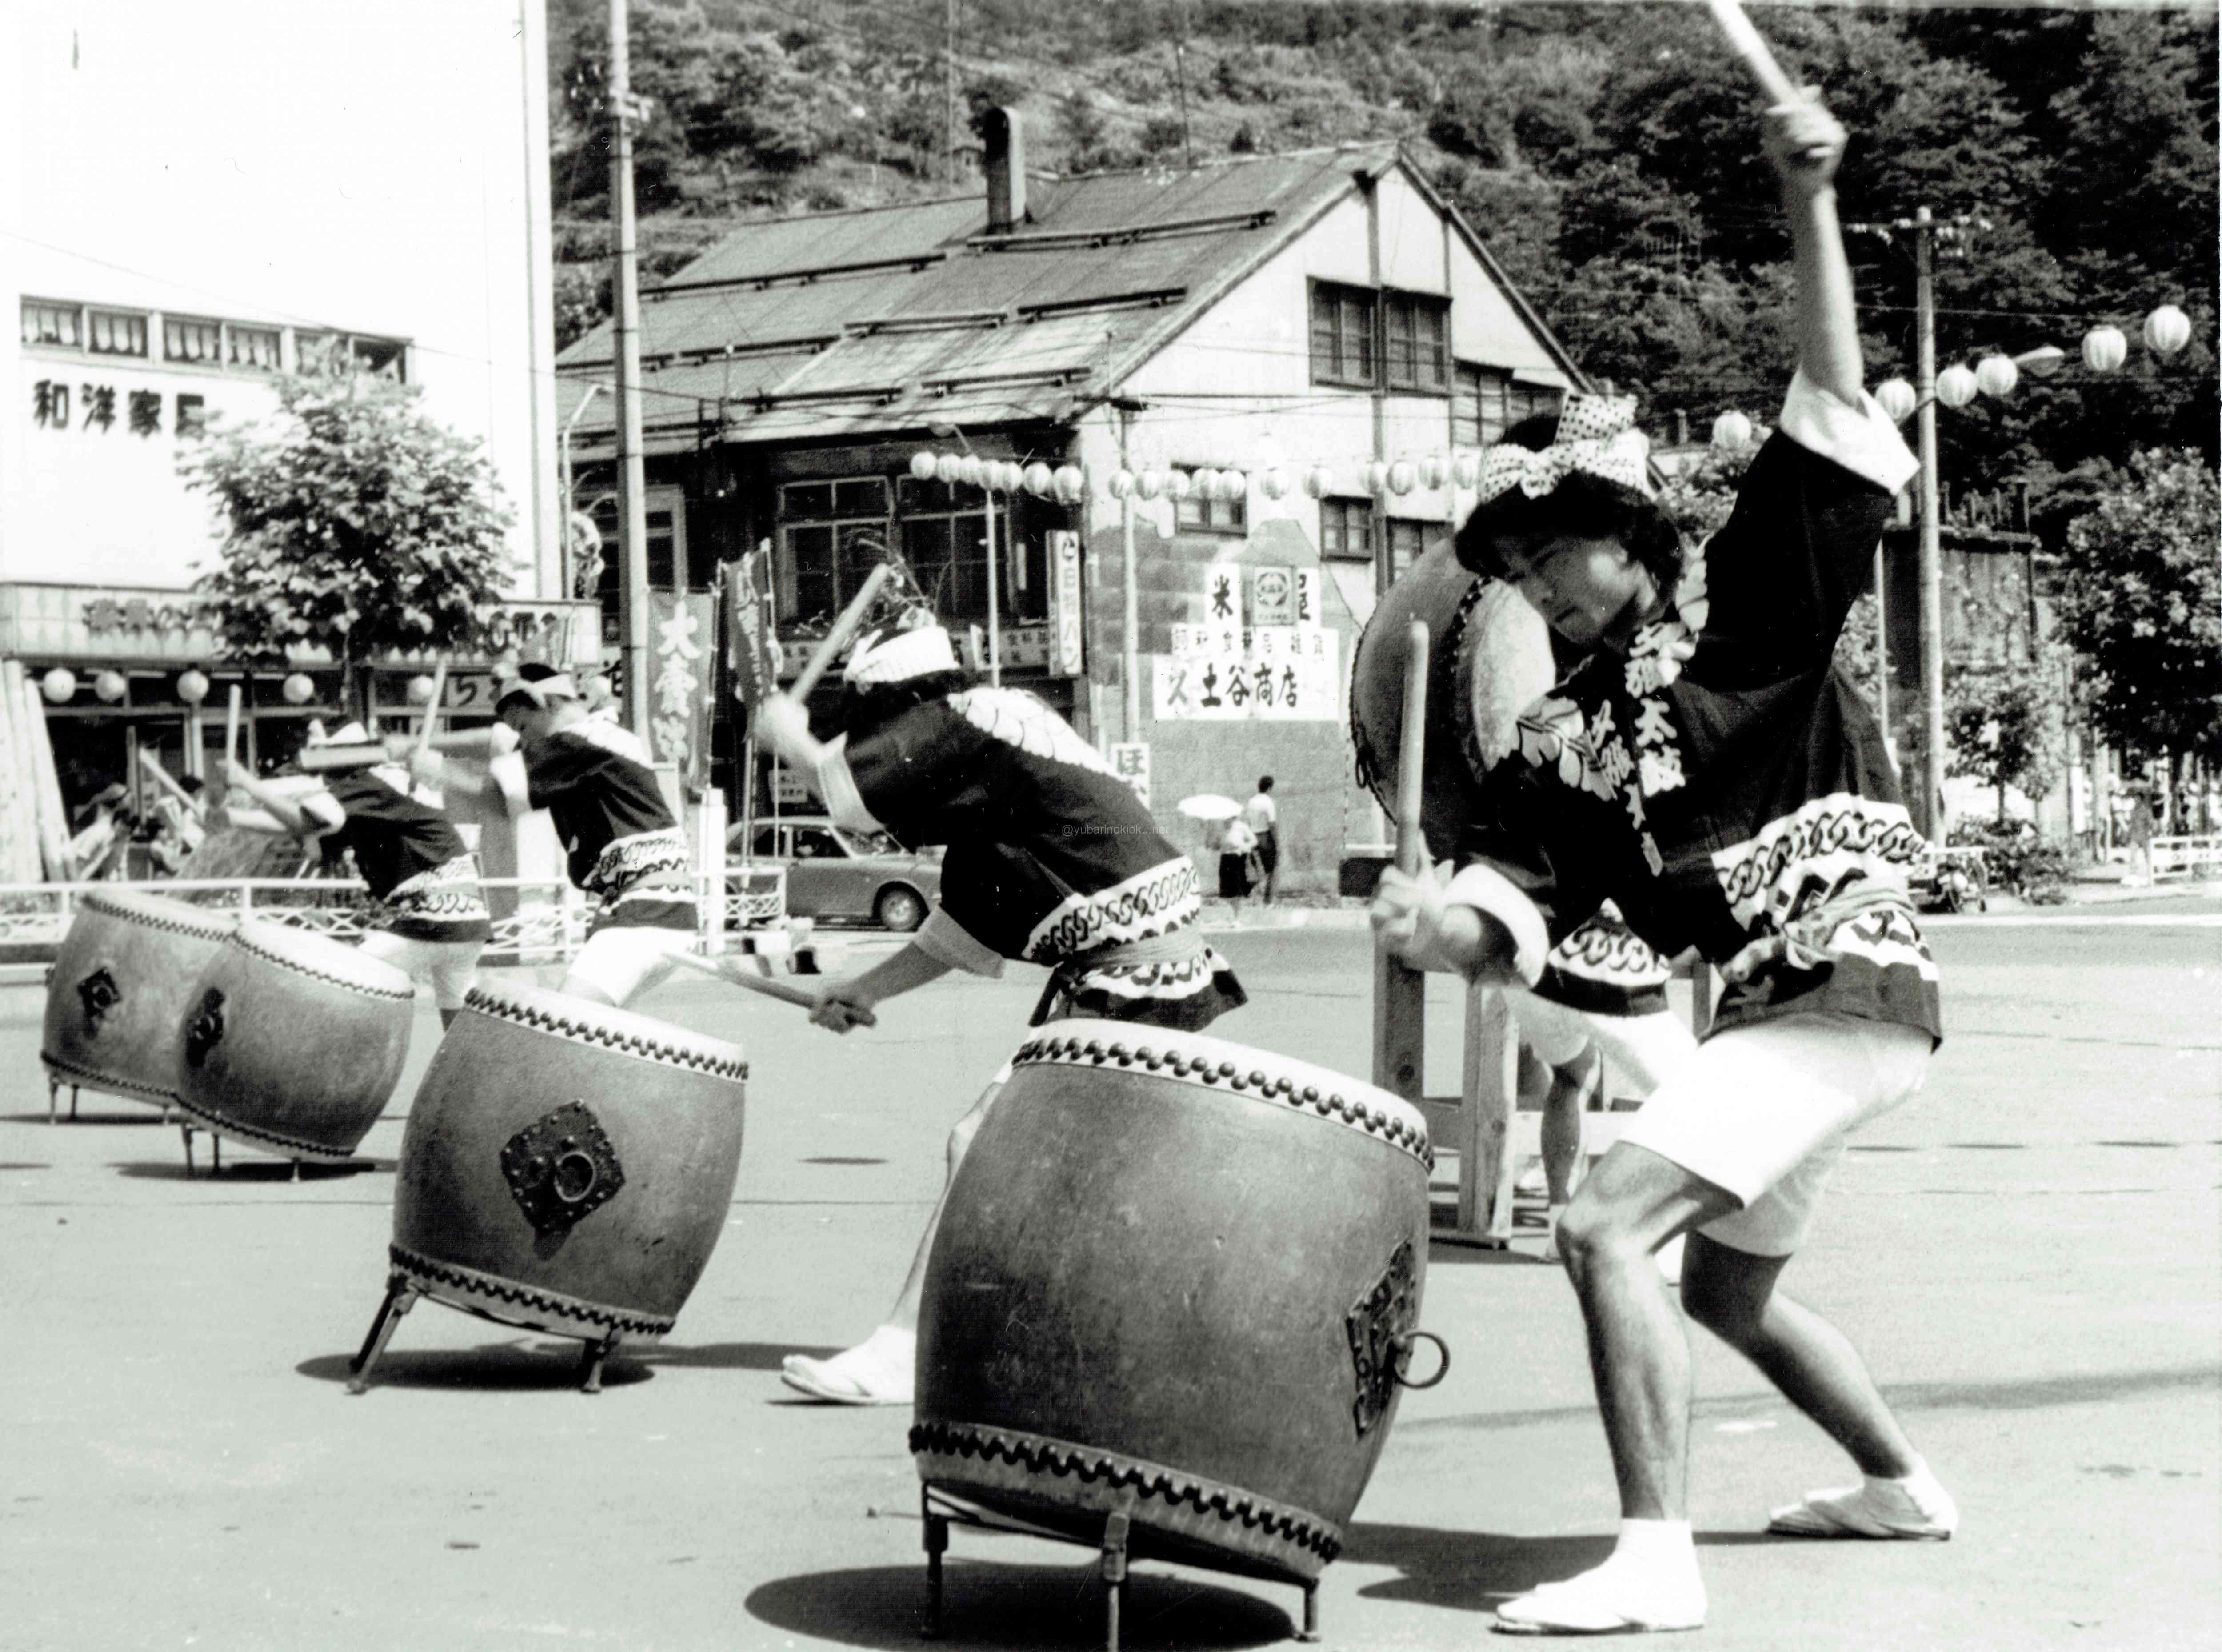 昭和40年代の夕張太鼓